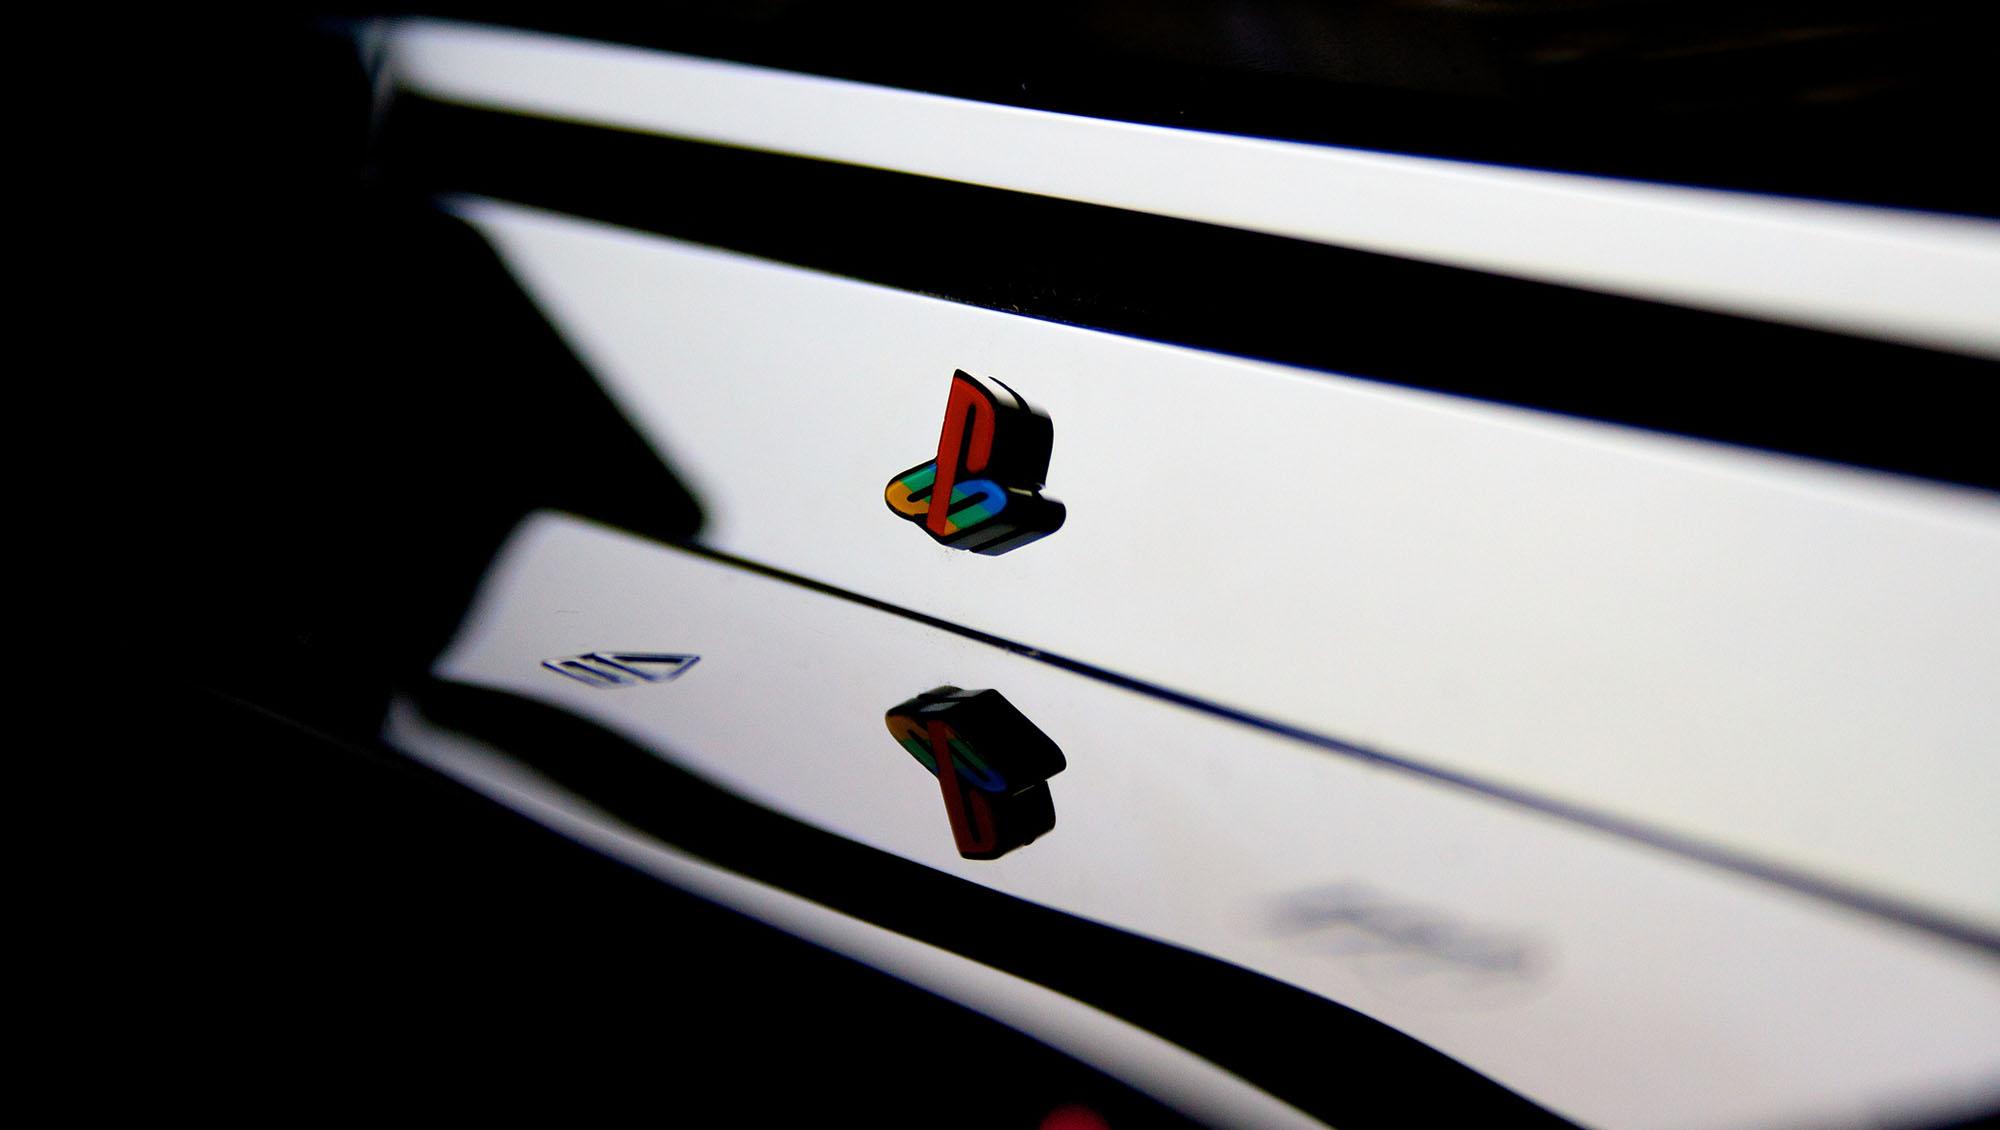 La PlayStation 5 sera disponible pour Noël 2020